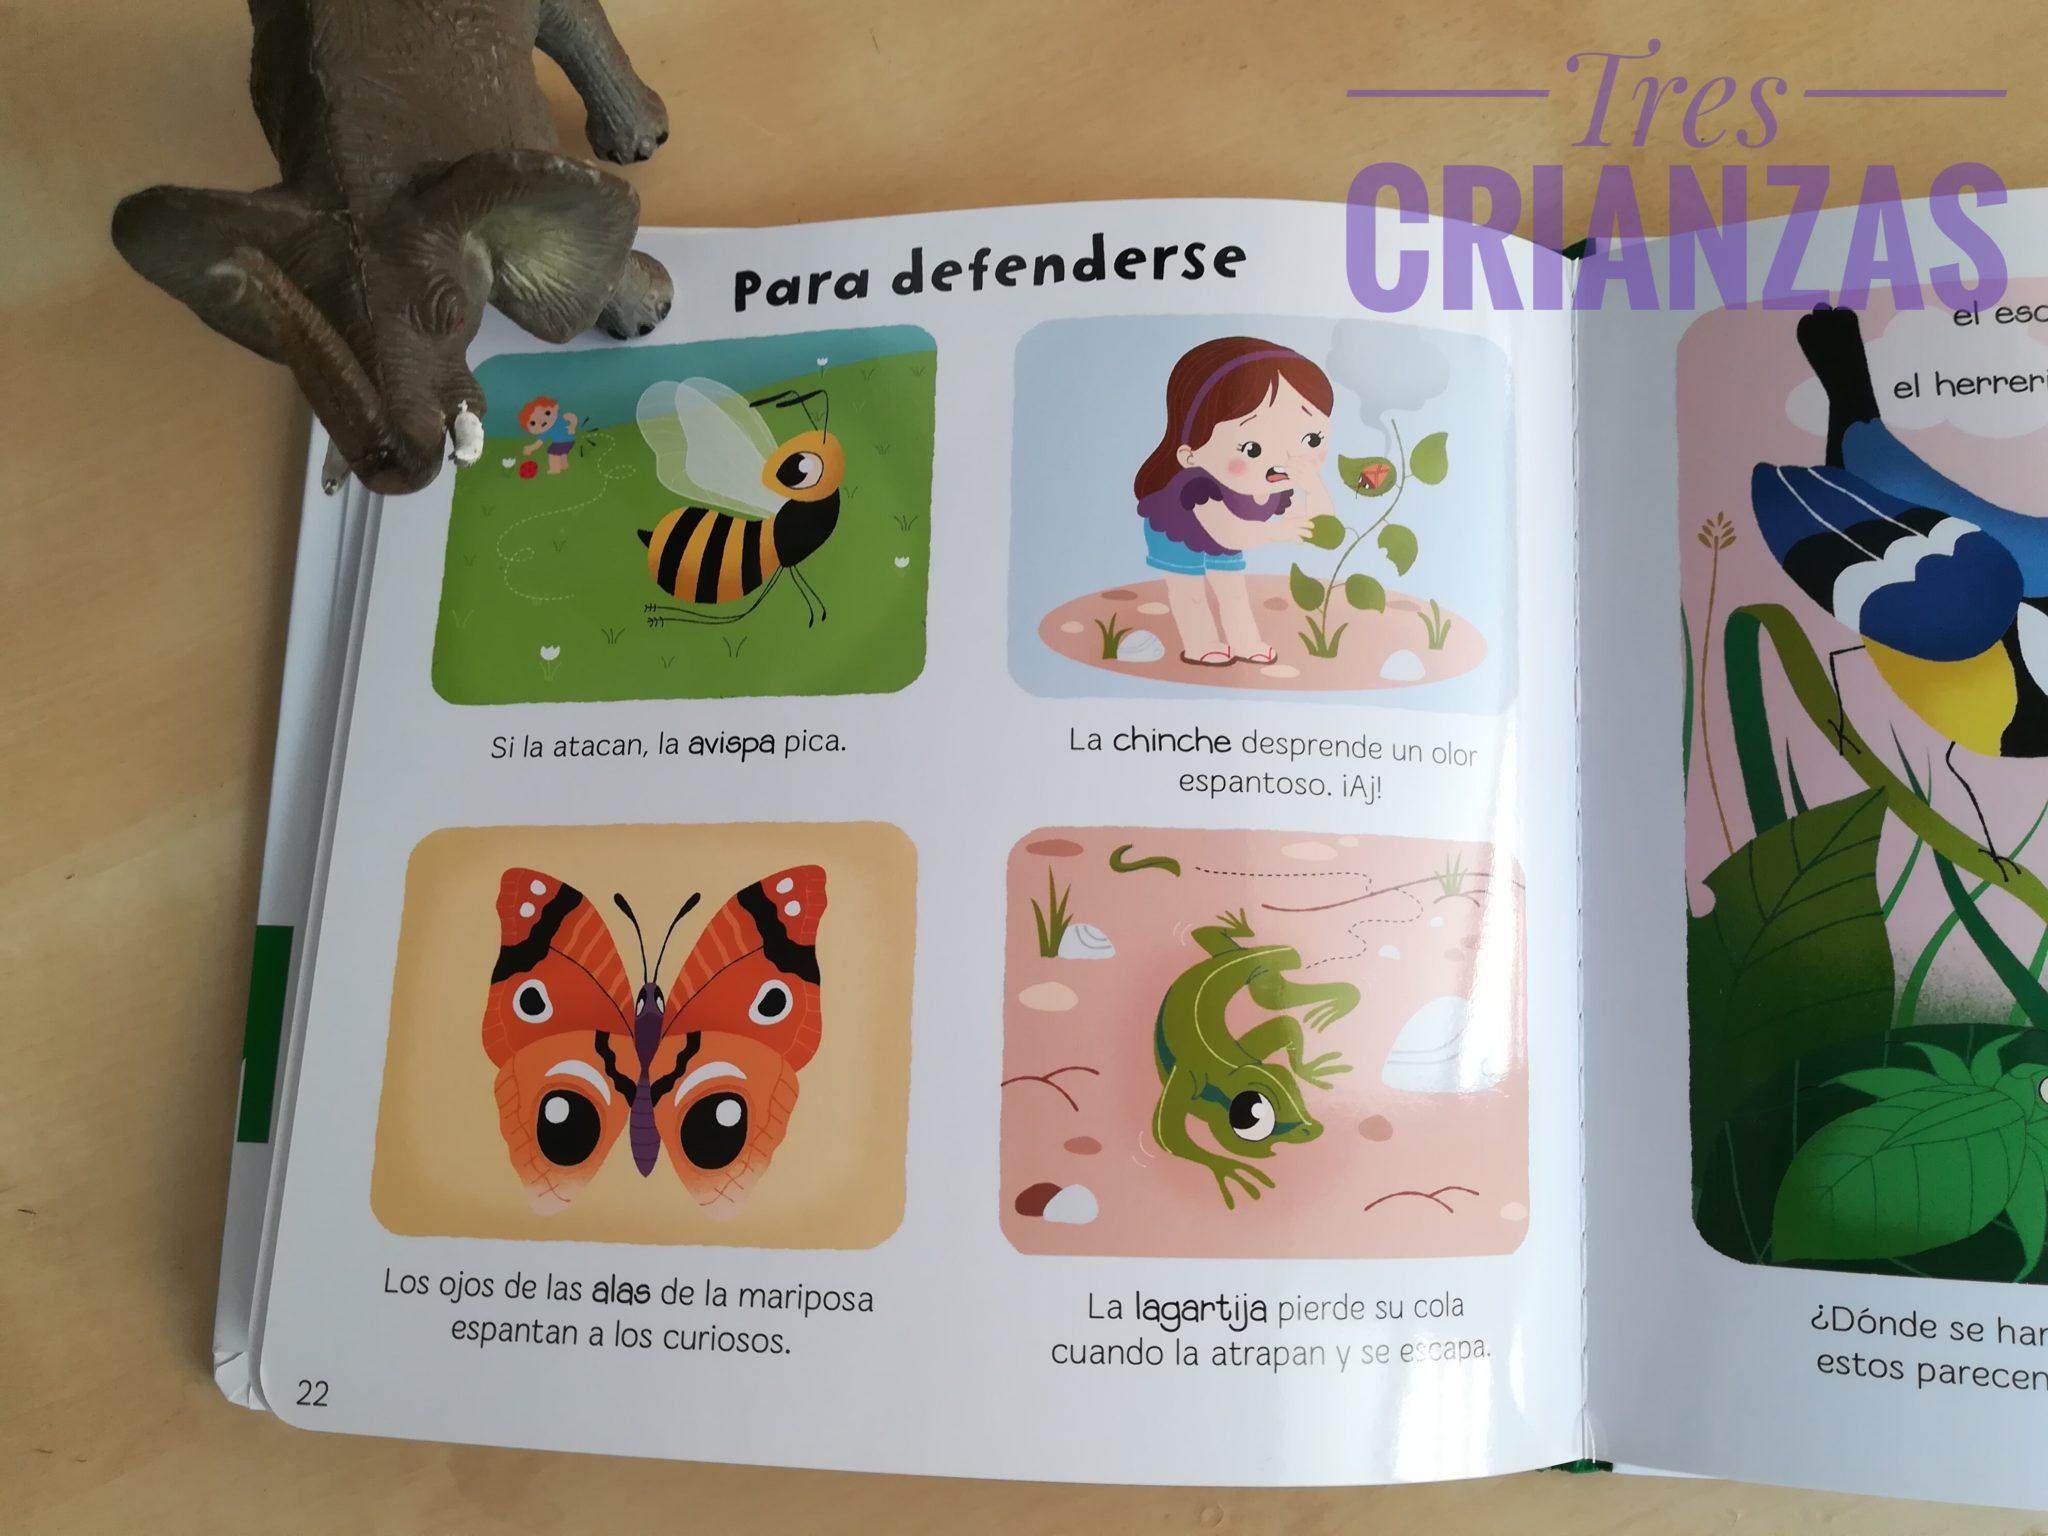 IMG 20180401 144655 01 - Cuentos para aprender bichos. Baby Enciclopedia Larousse.